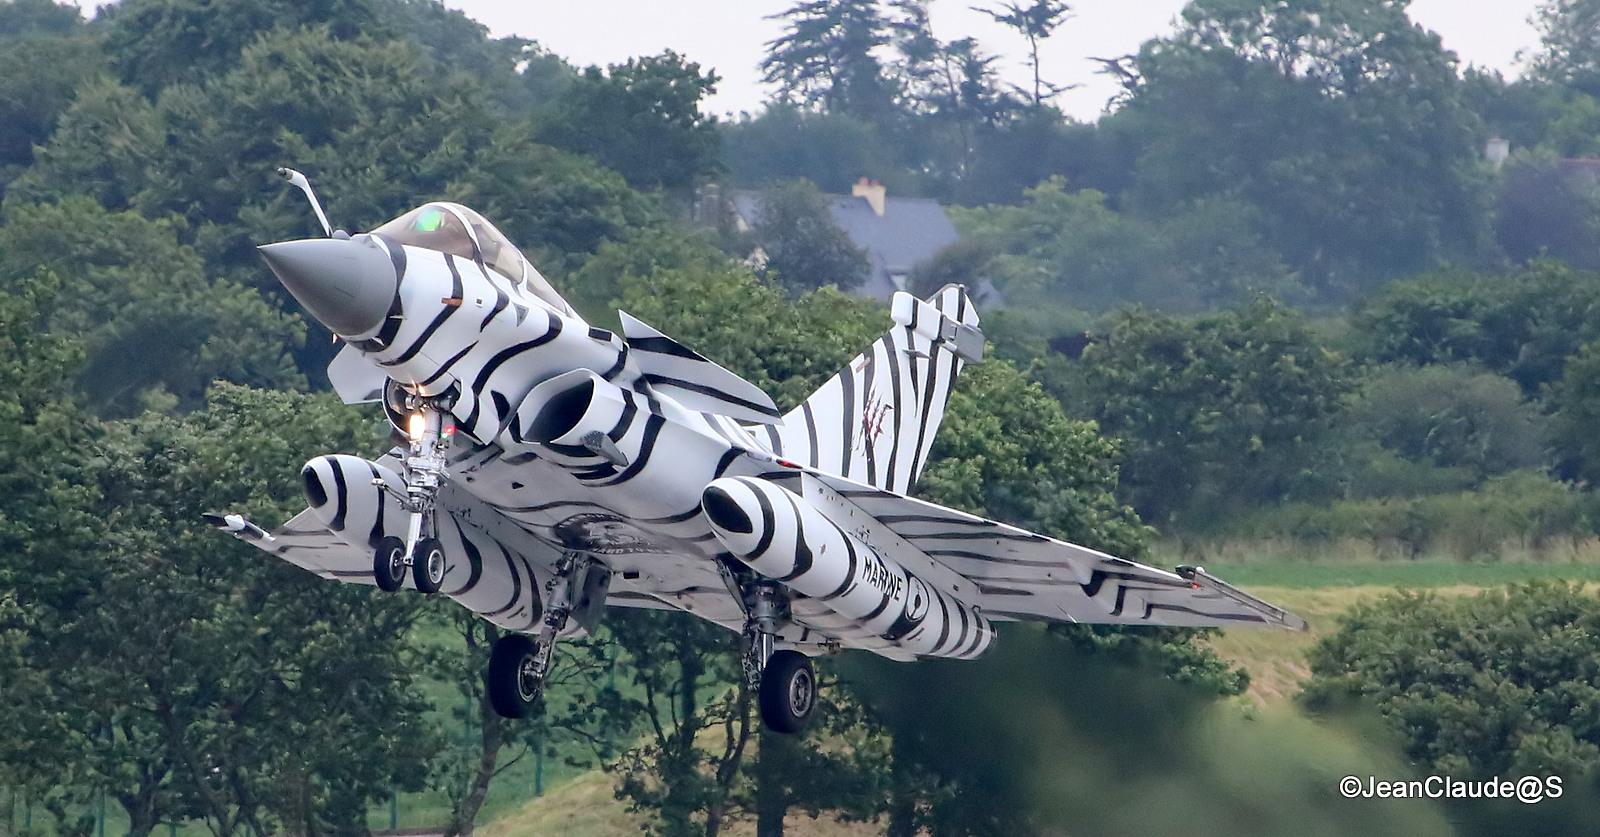 NATO Tiger Meet 2017 Landivisiau Img_1372_filtered-526f847